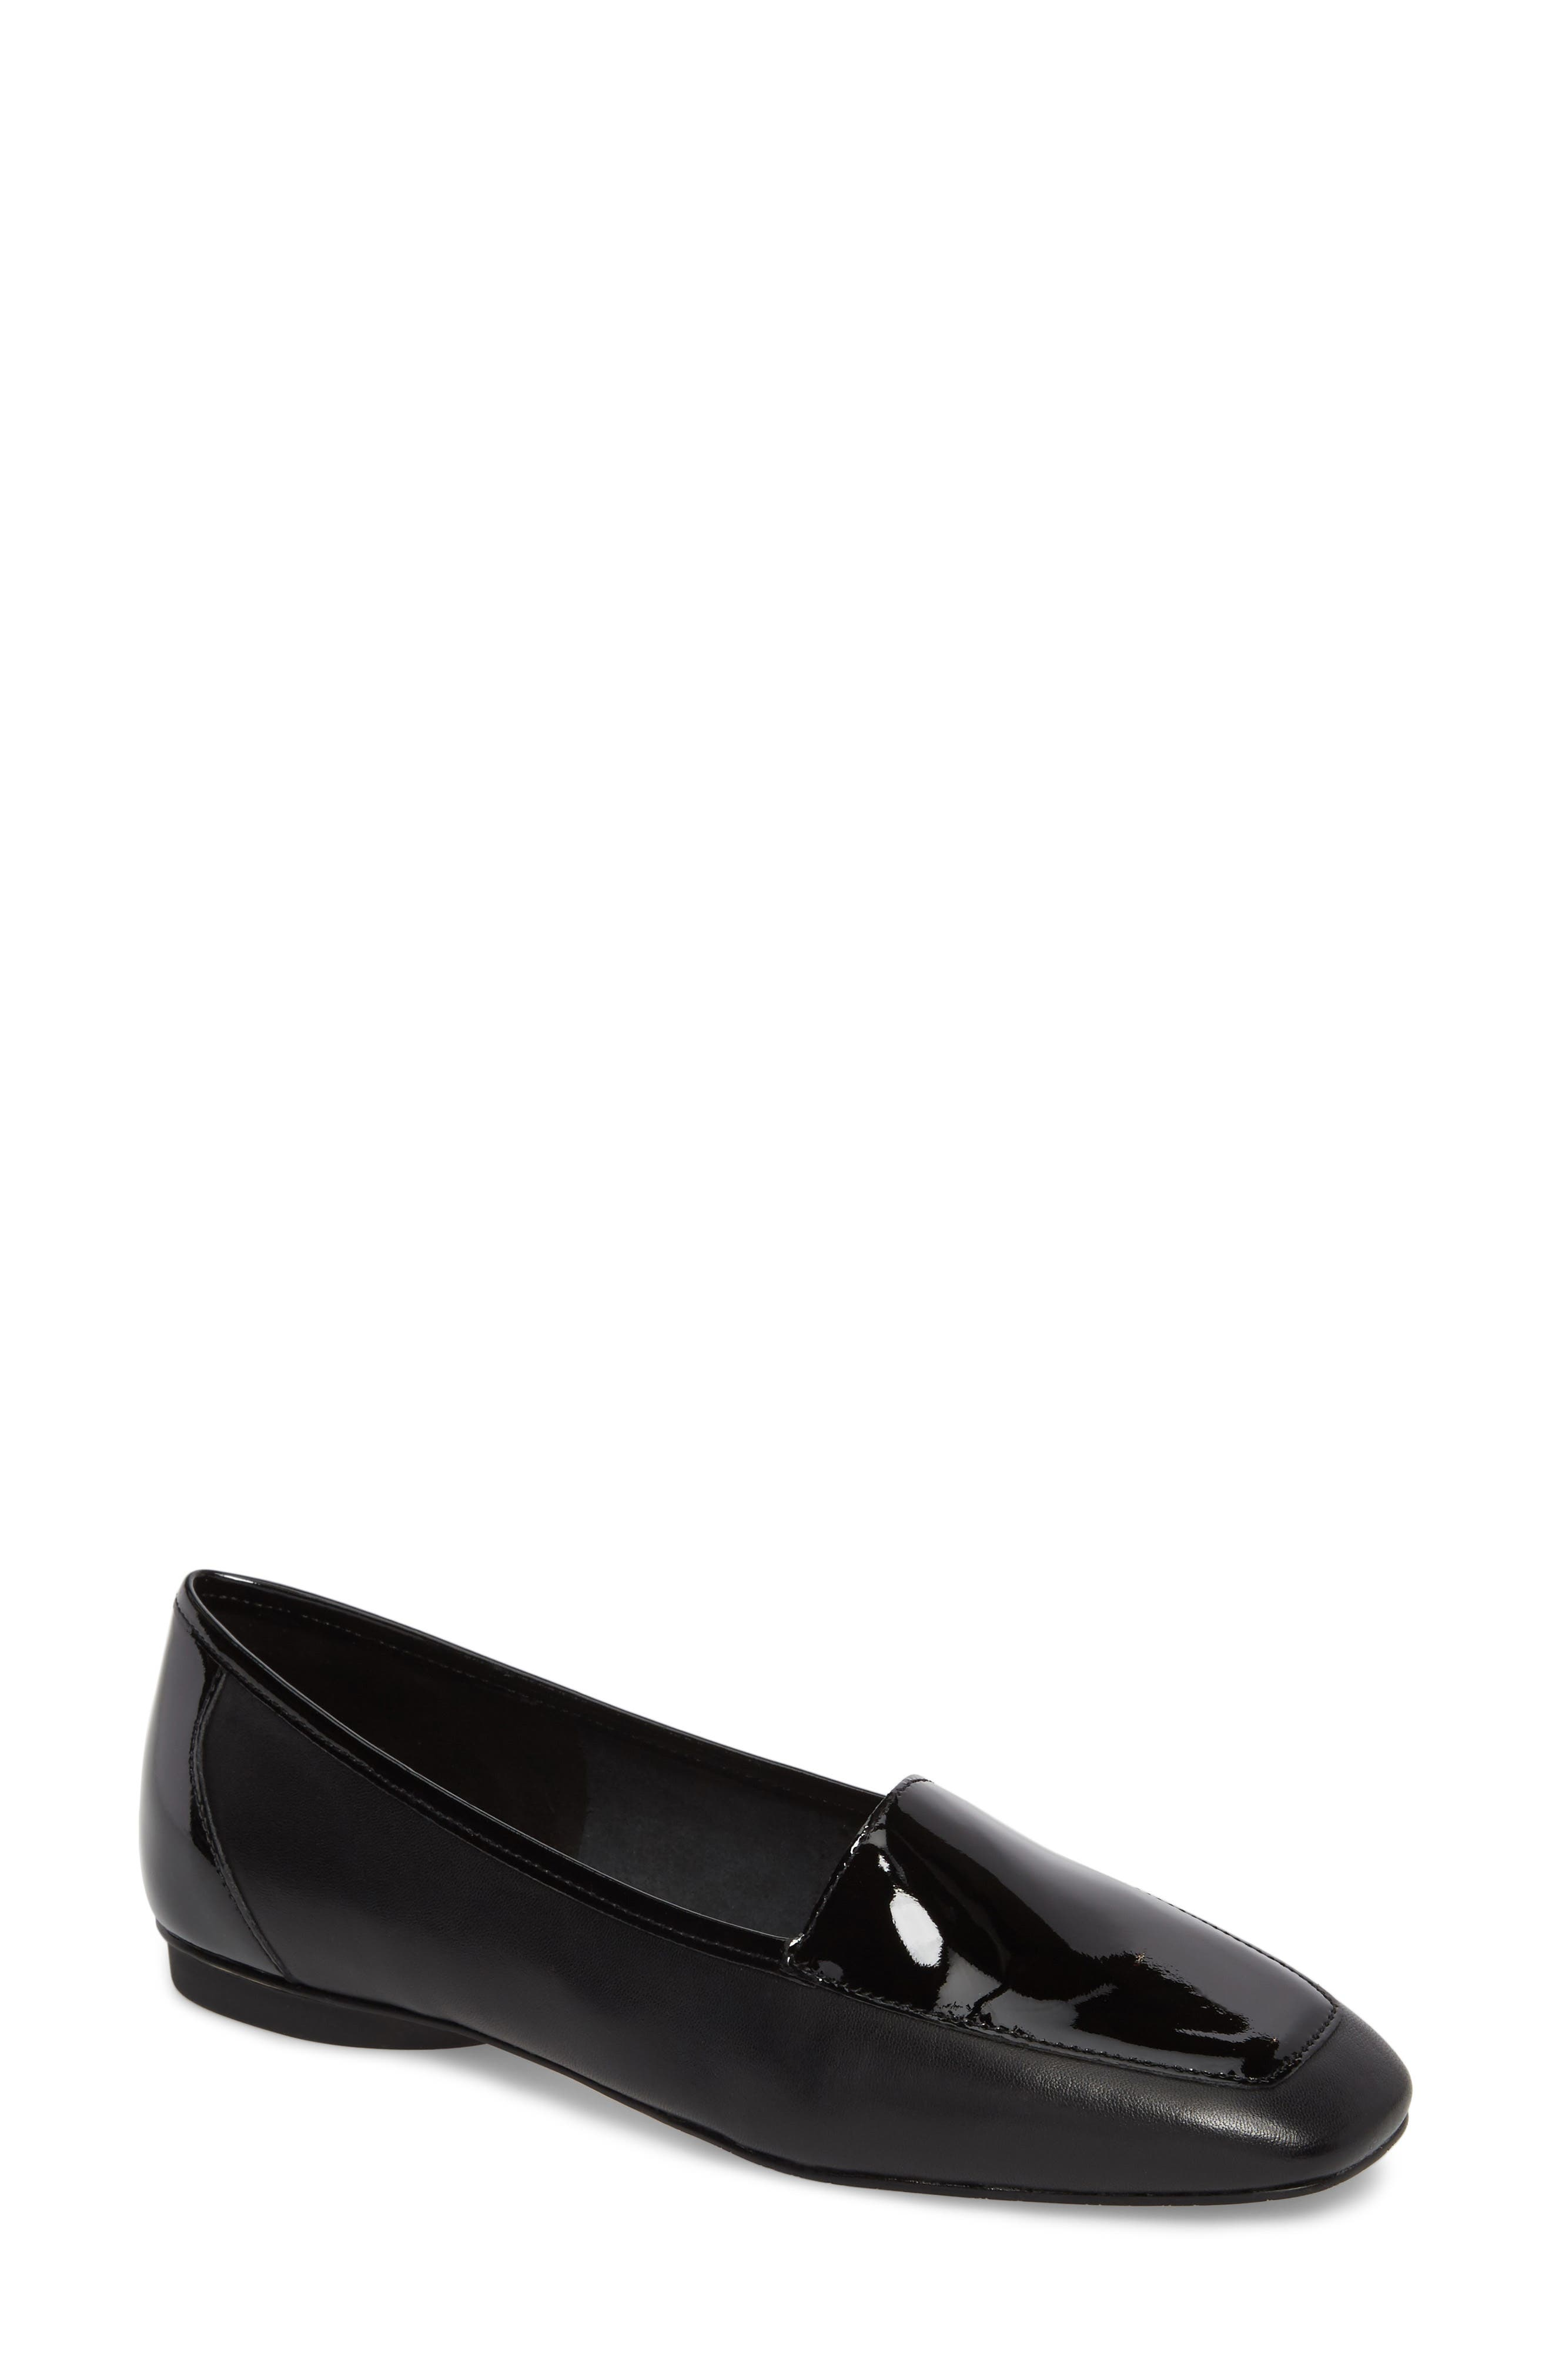 Deedee Apron Toe Flat,                         Main,                         color, BLACK LEATHER